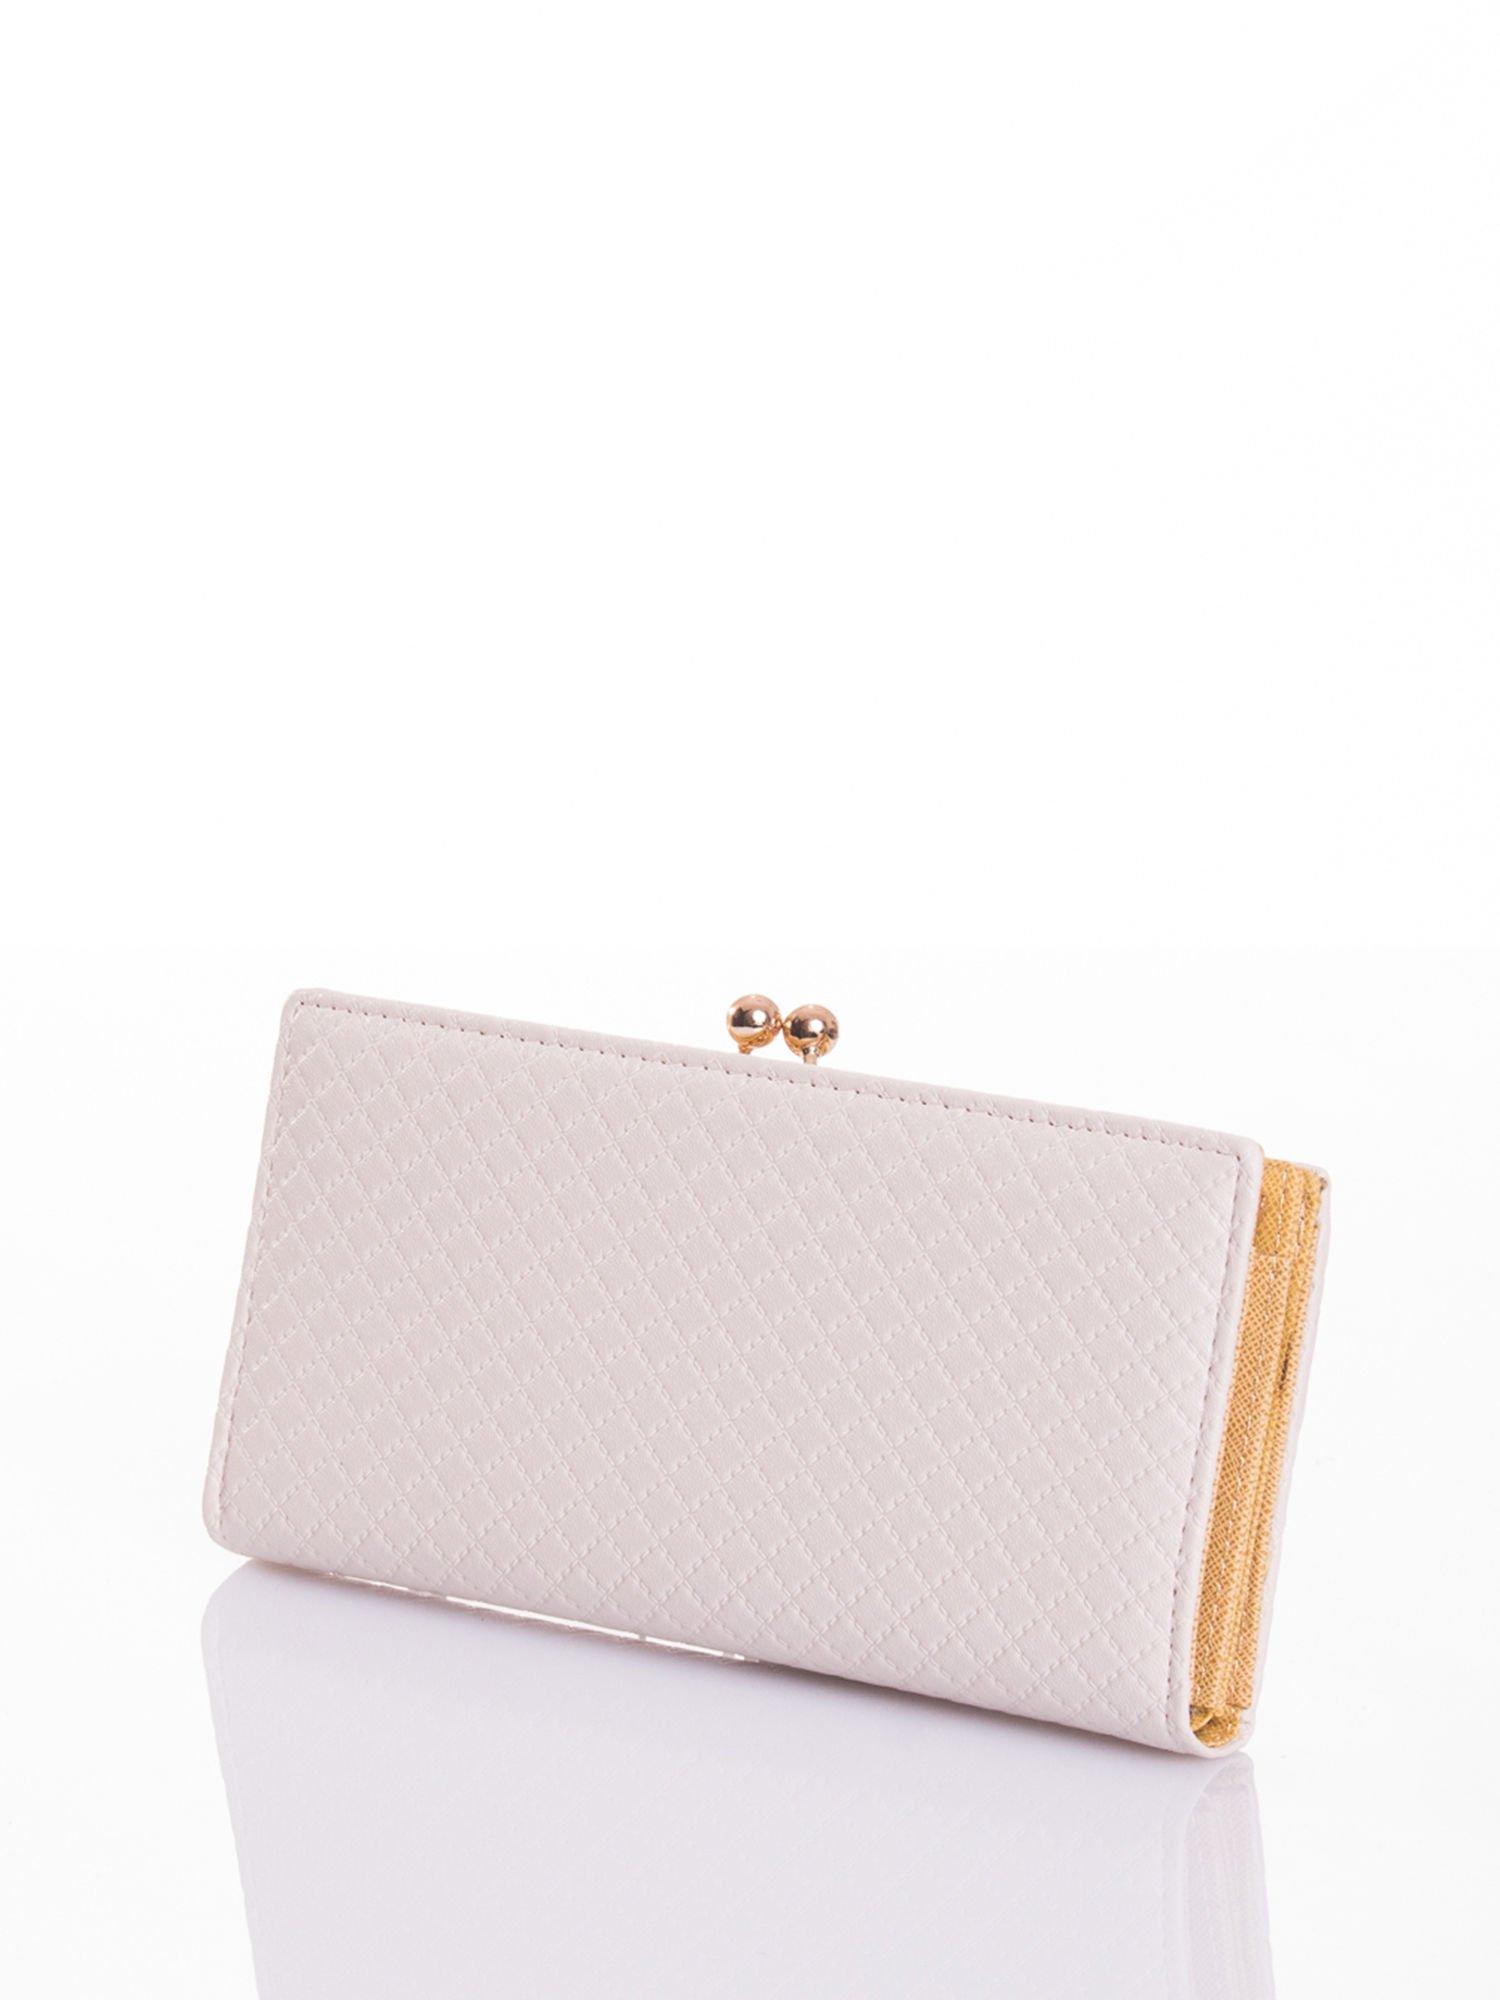 Ecru elegancki portfel na bigiel                                  zdj.                                  2